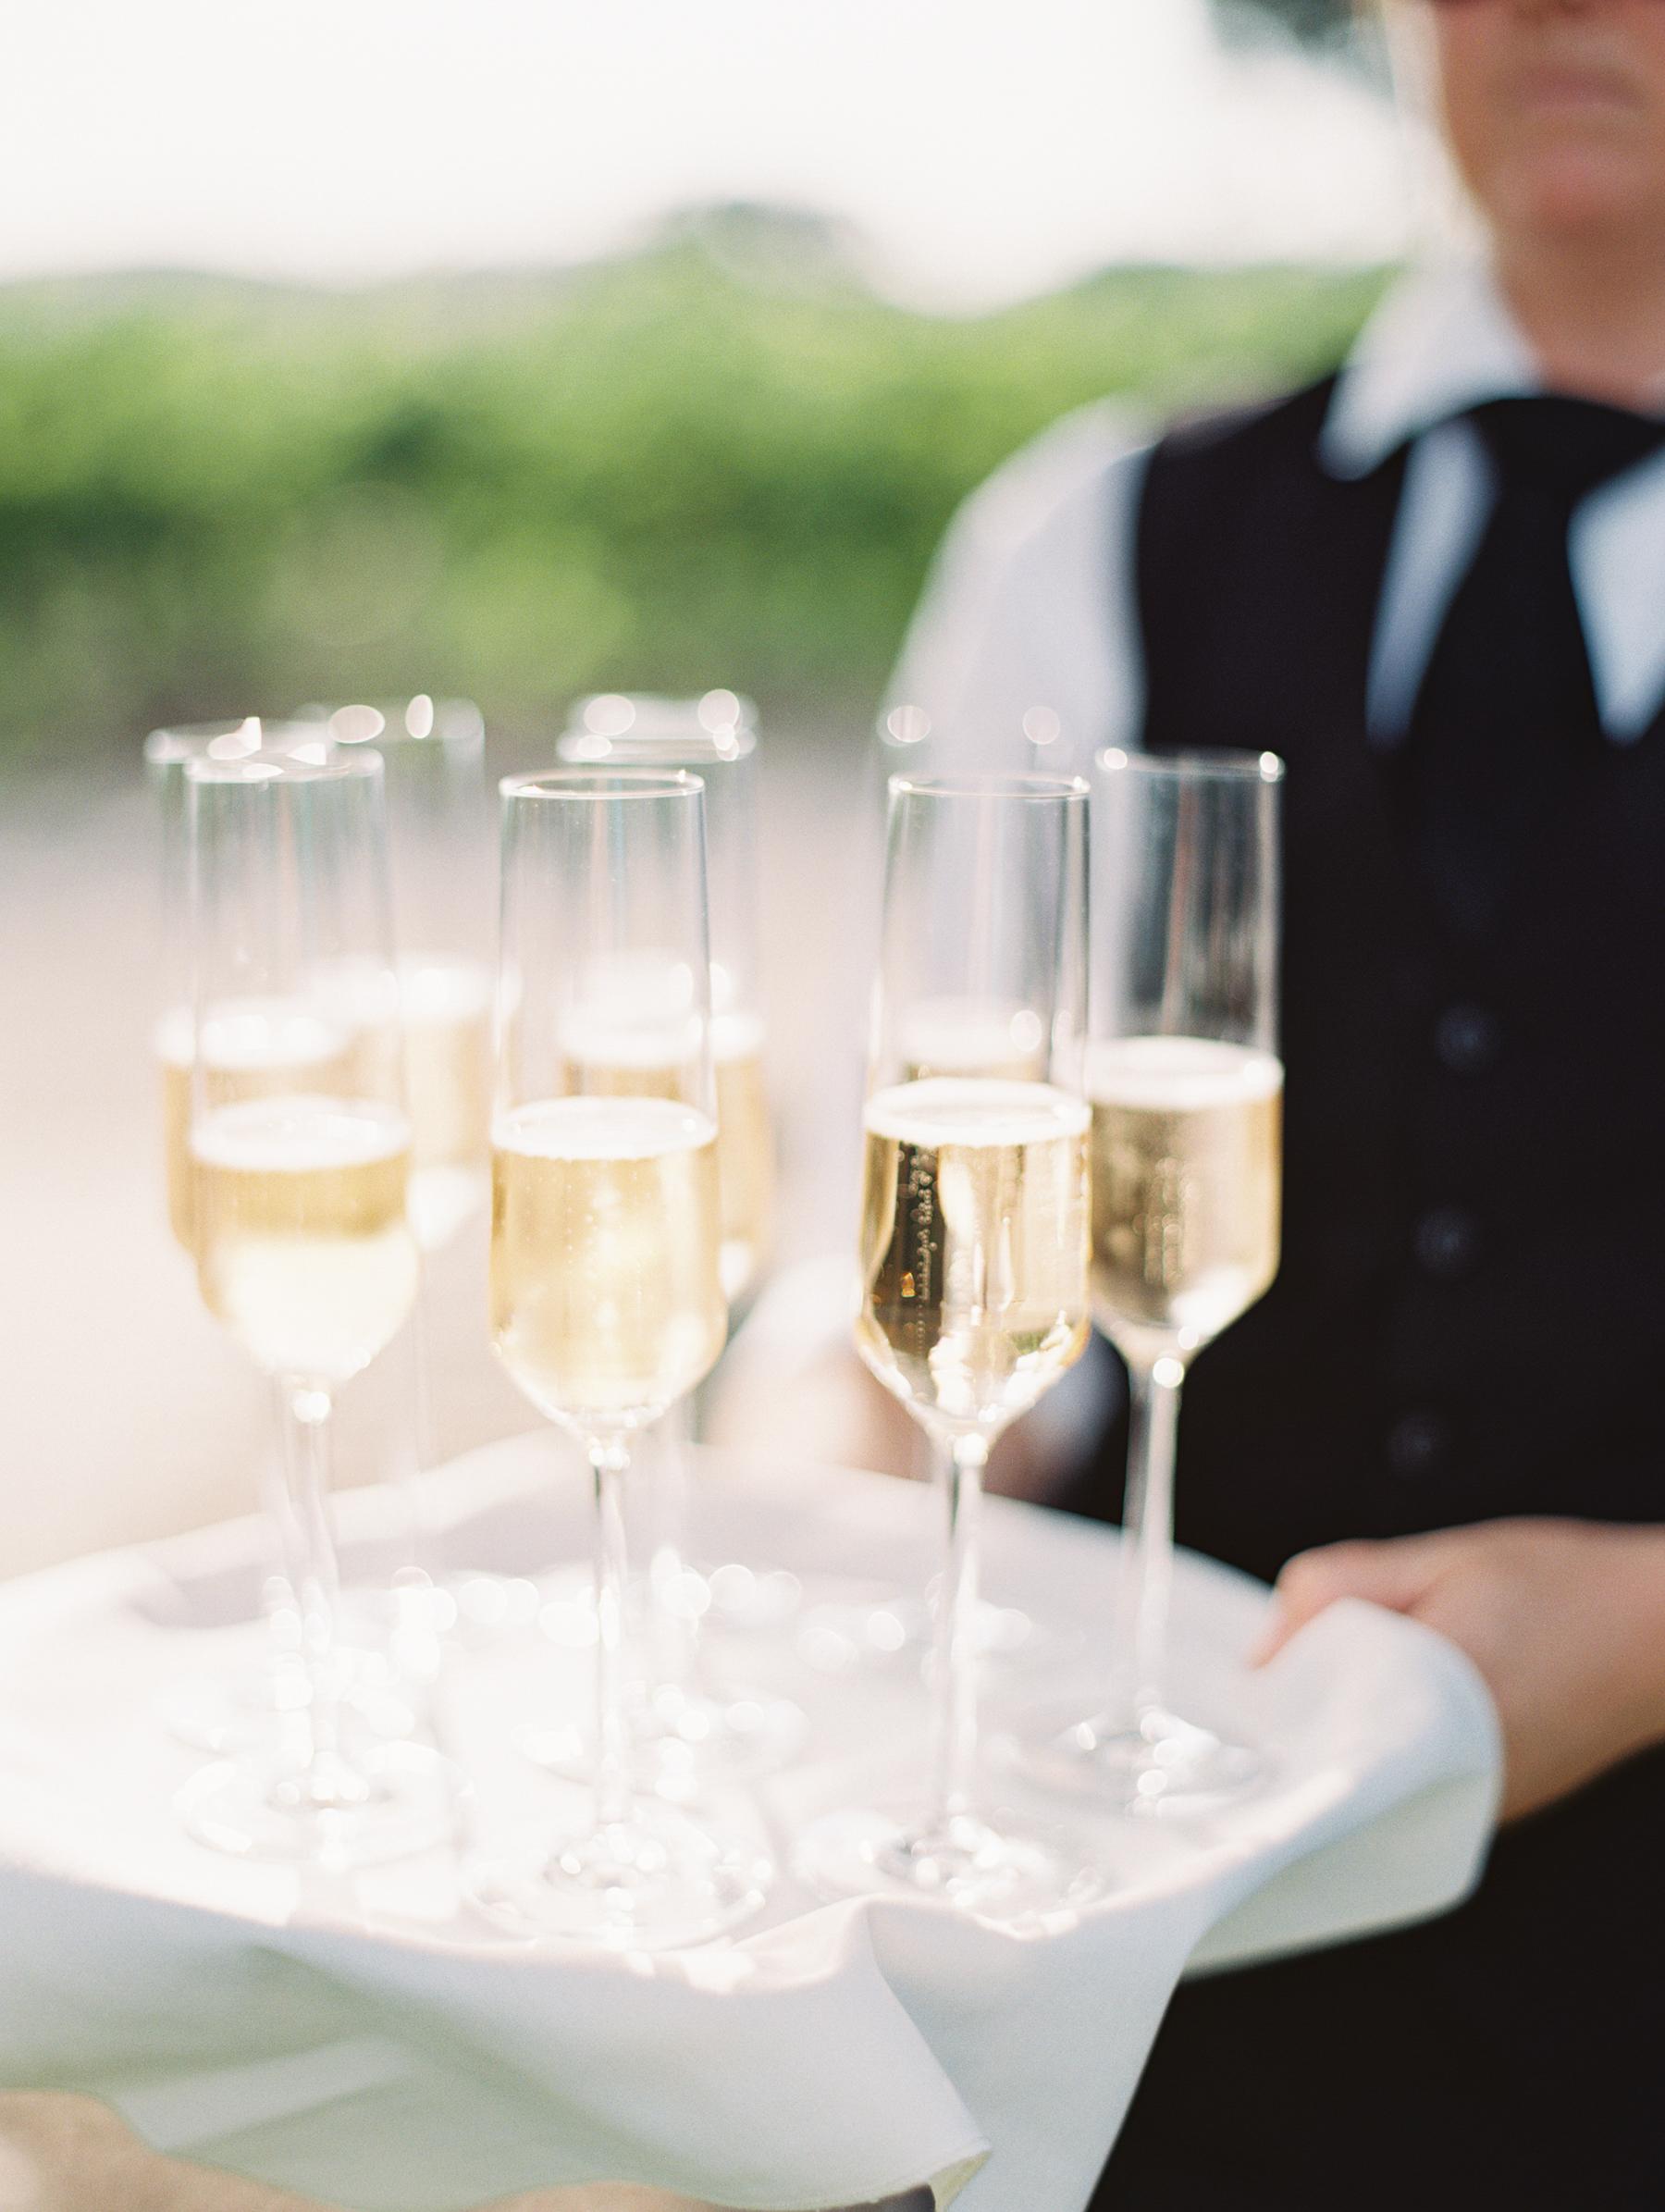 santabarbarwedding.com | Photo: Kurt Boomer | Shades of Gray wedding ideas